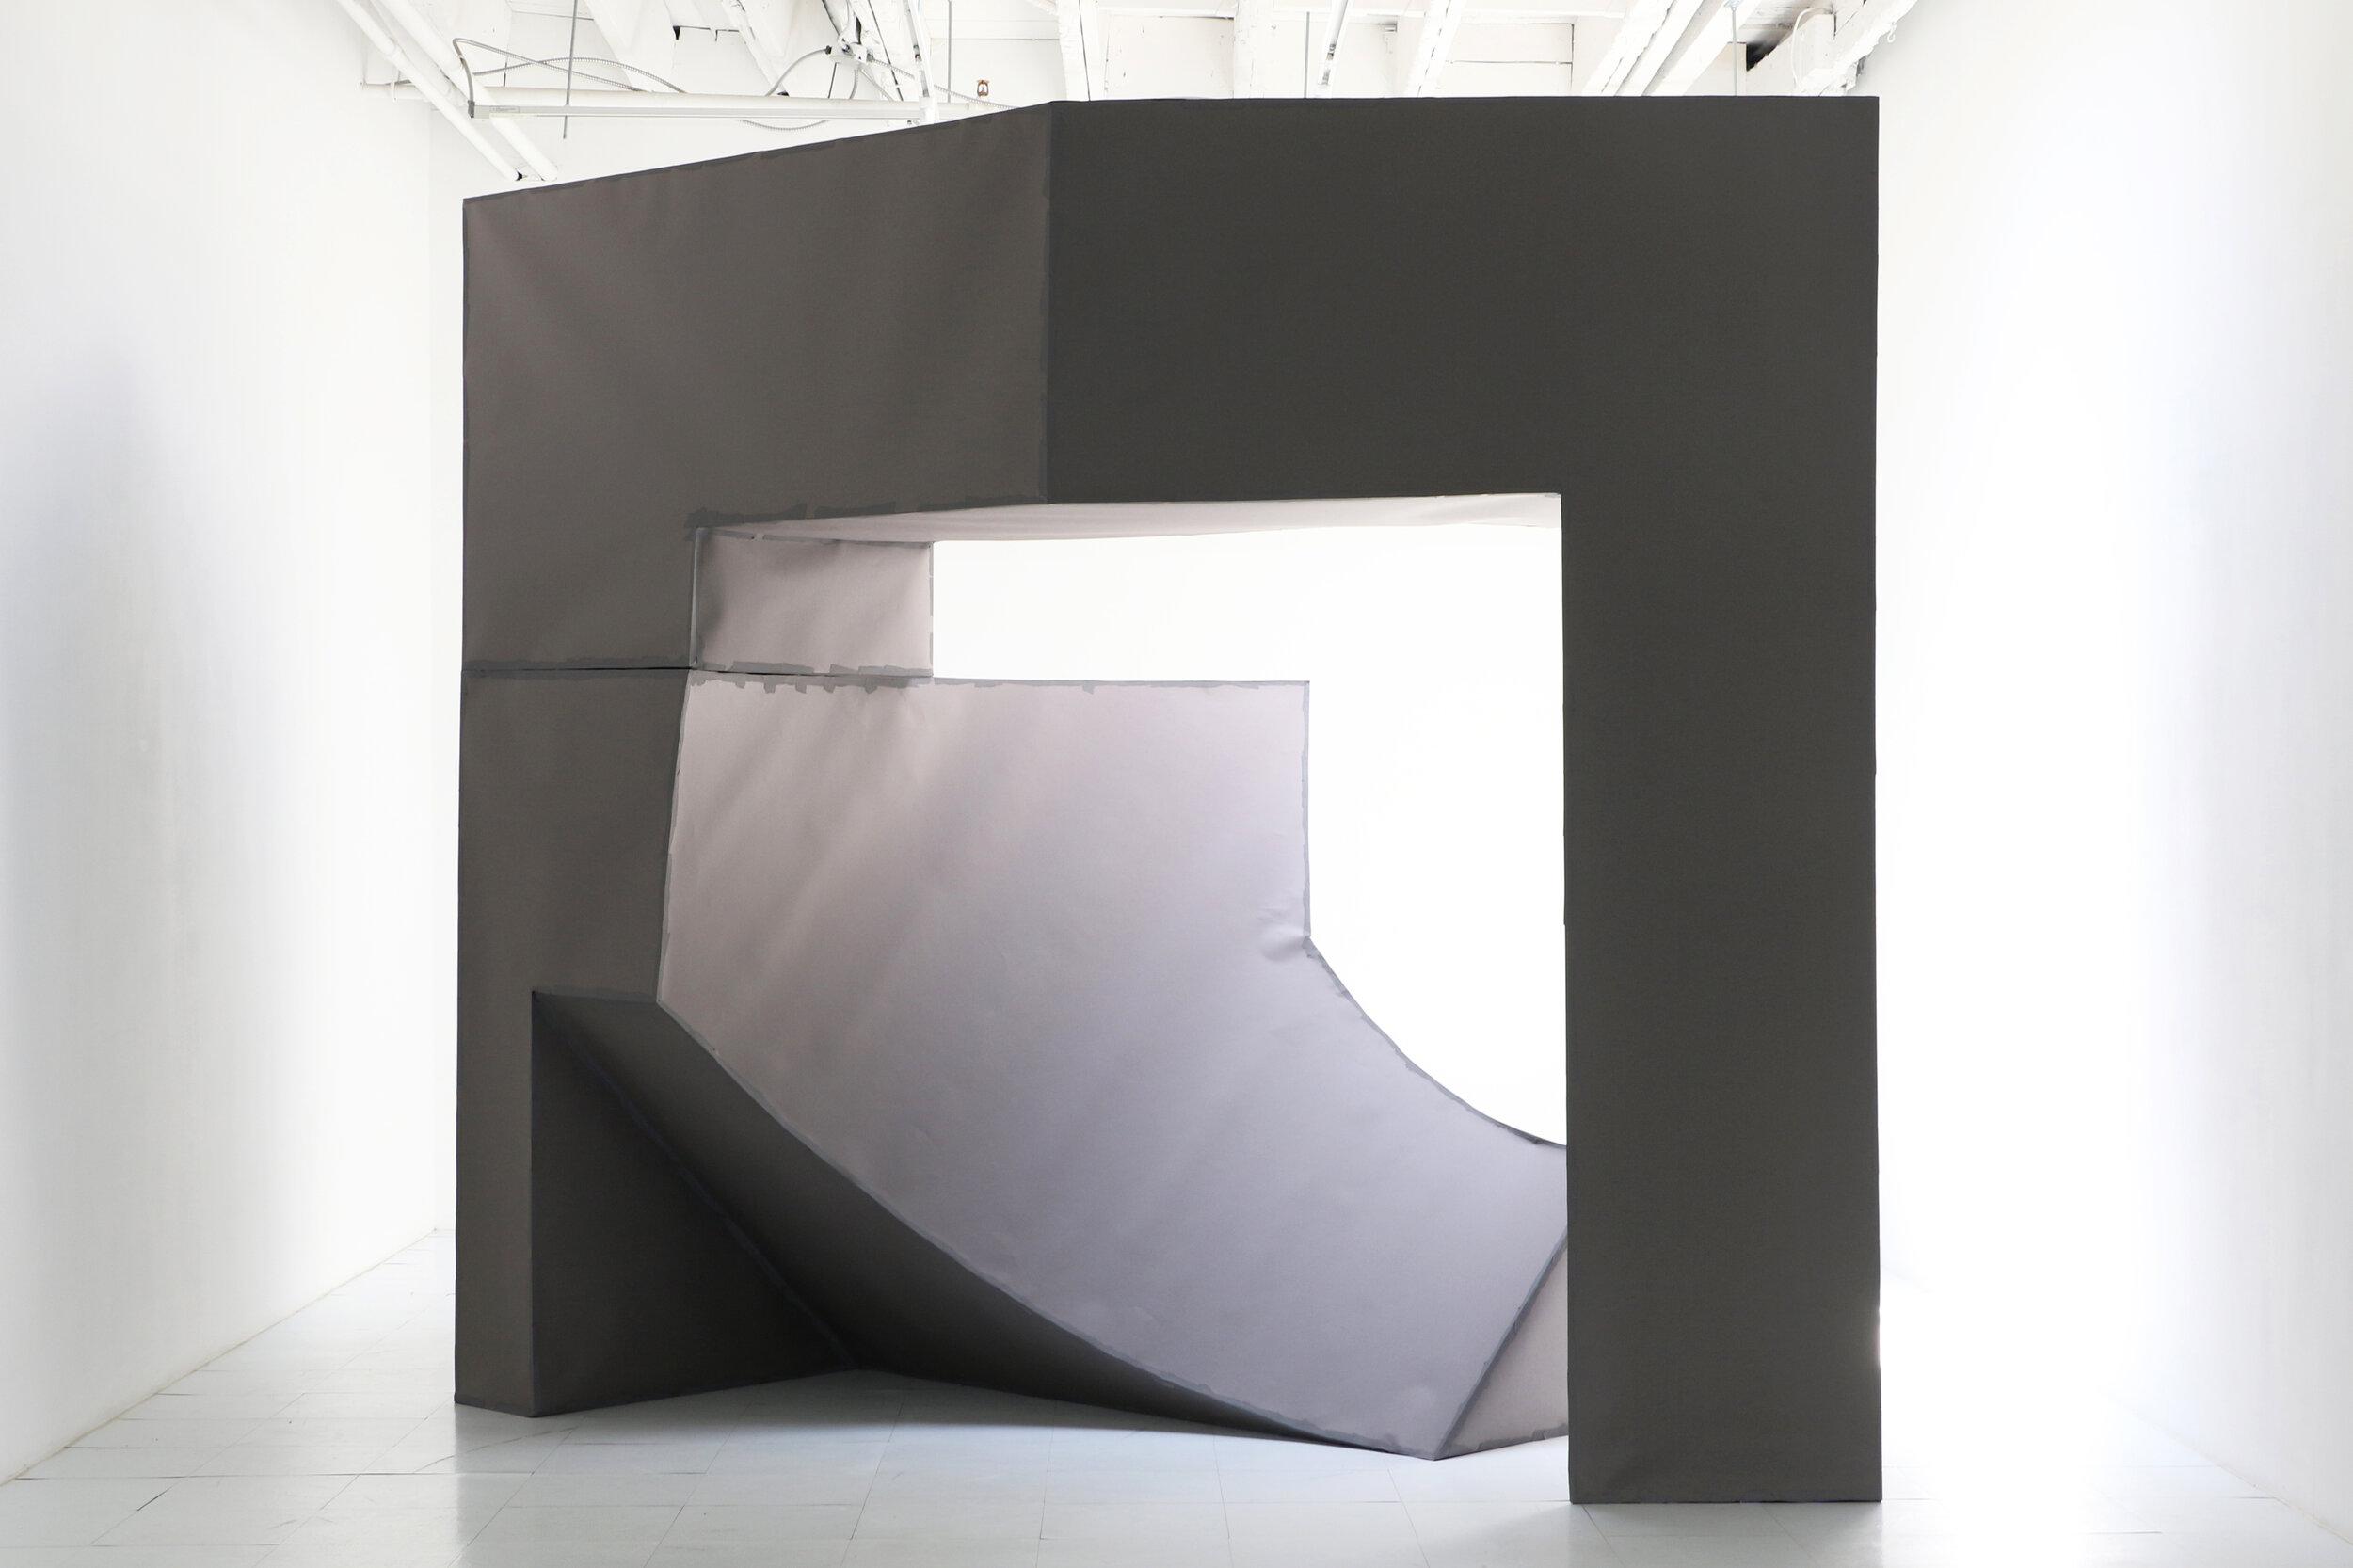 JA_Toriocade_2019_95 x 104 x 89 inches_site specific paper installation (2).jpg